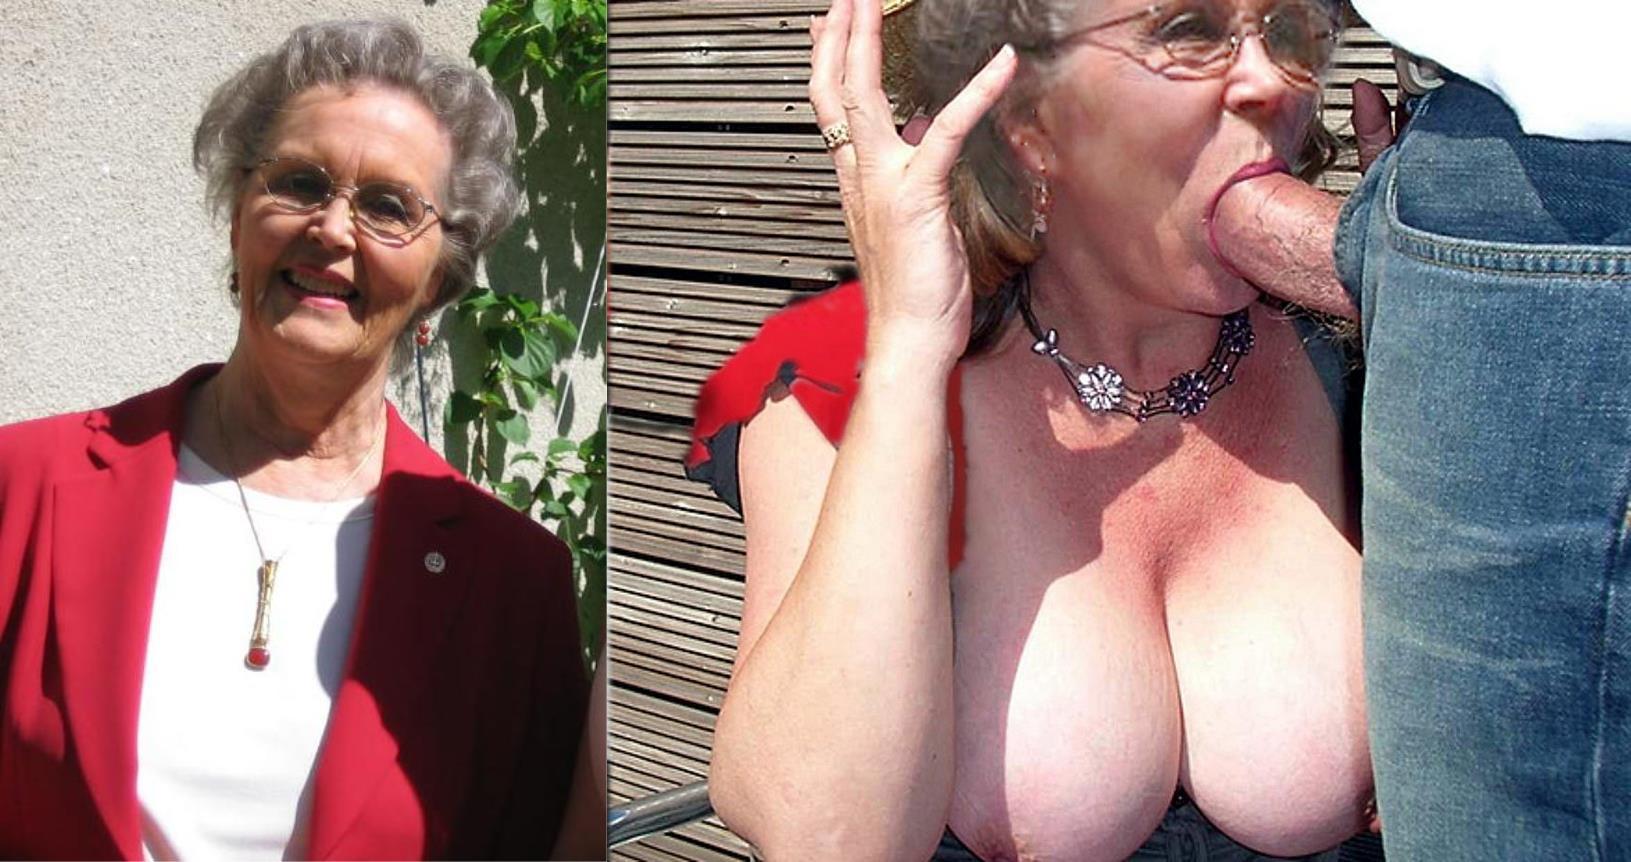 horny phone ladies dating mature